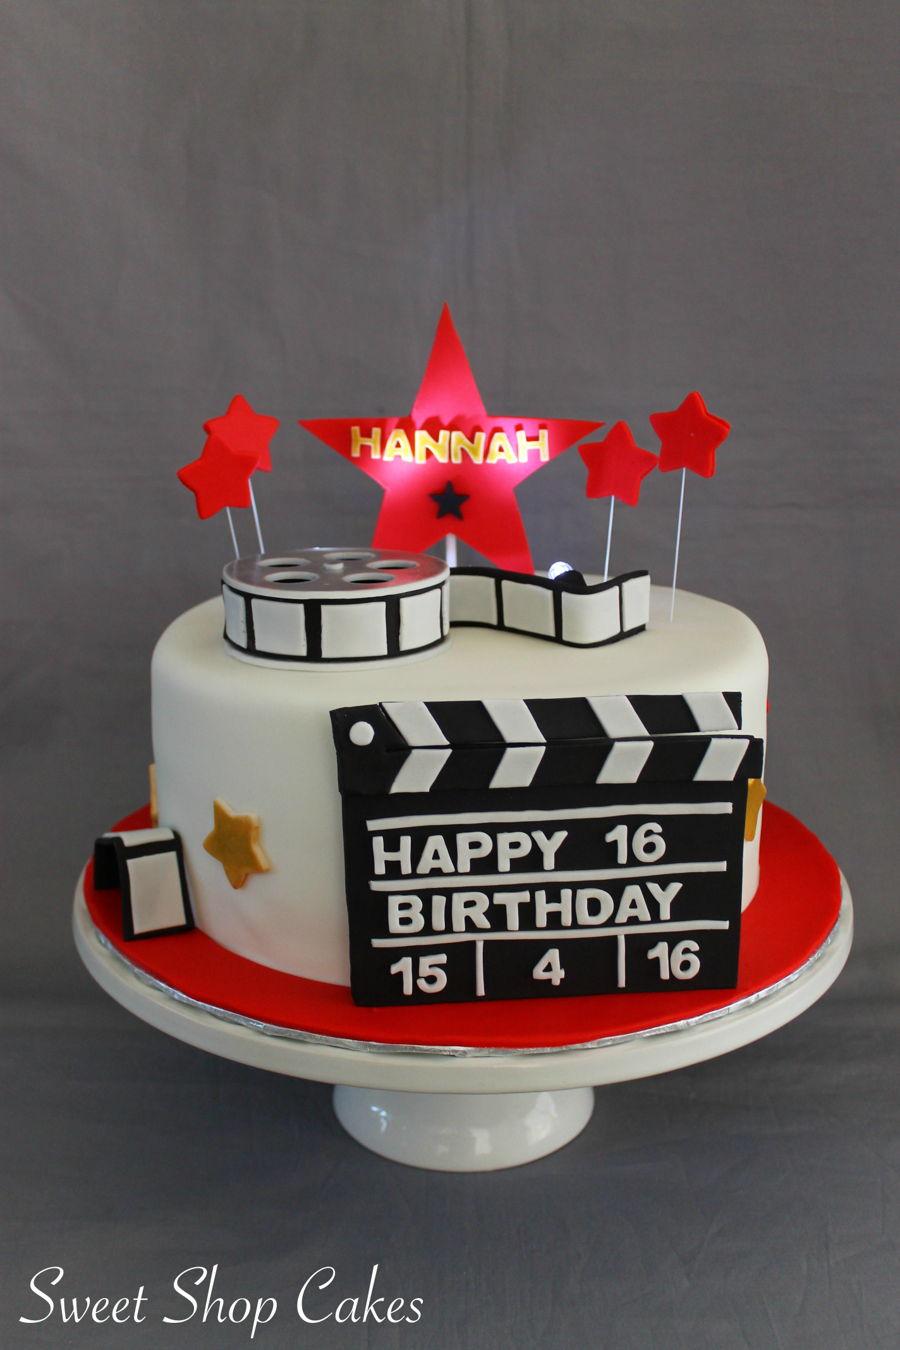 900_hollywood-birthday-cake-937512g4SlT.jpg